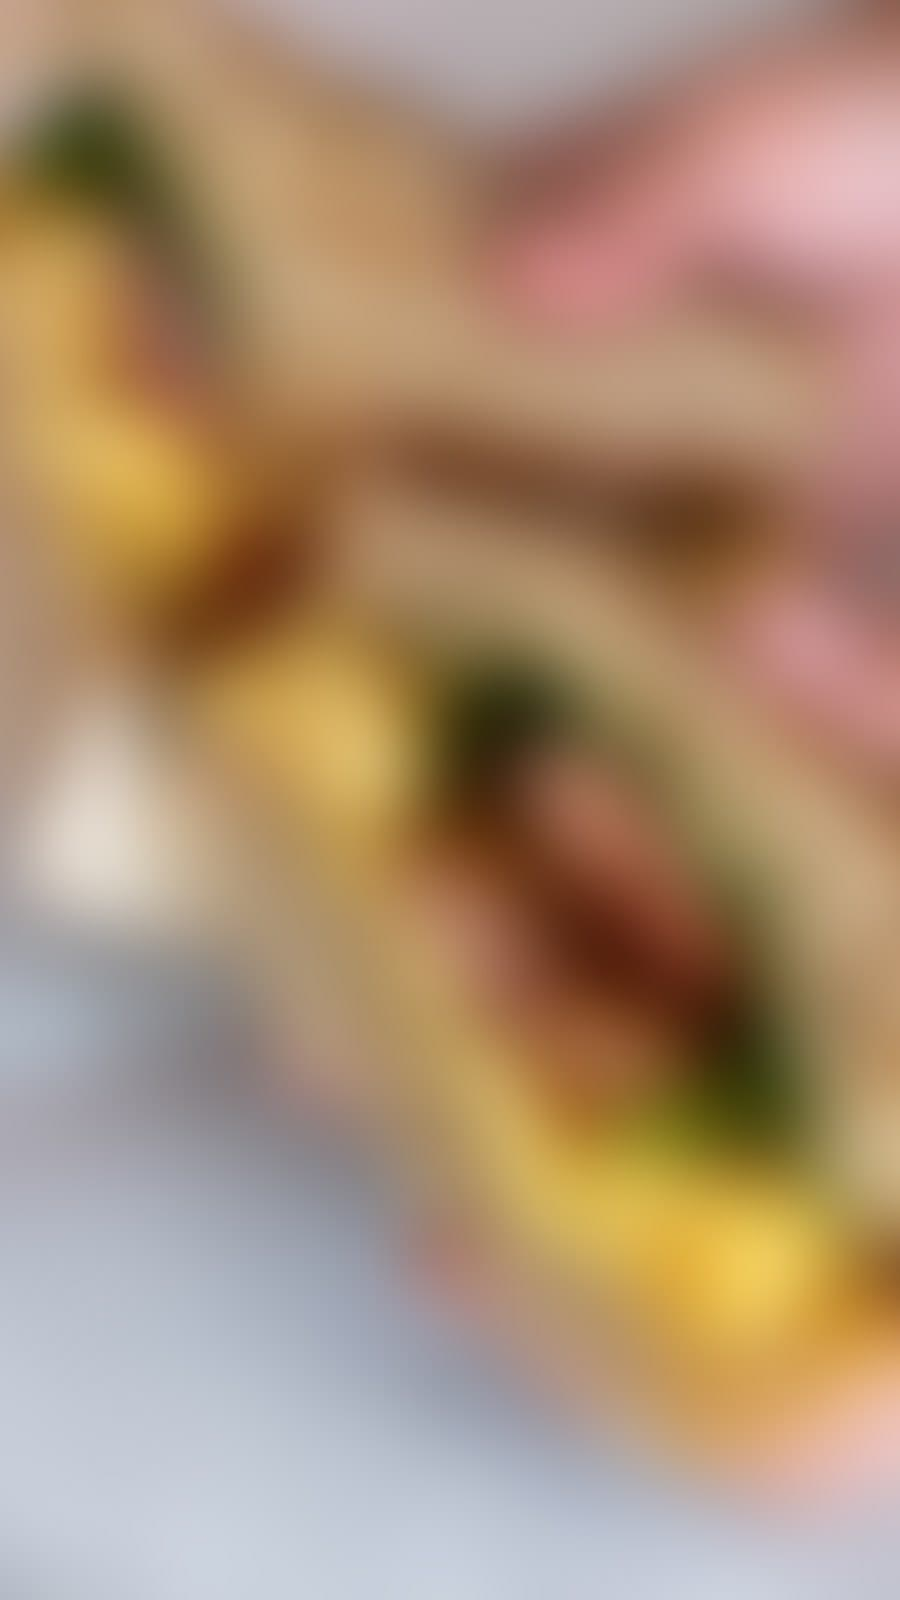 sandwich-scramble-egg-tocino-panitier